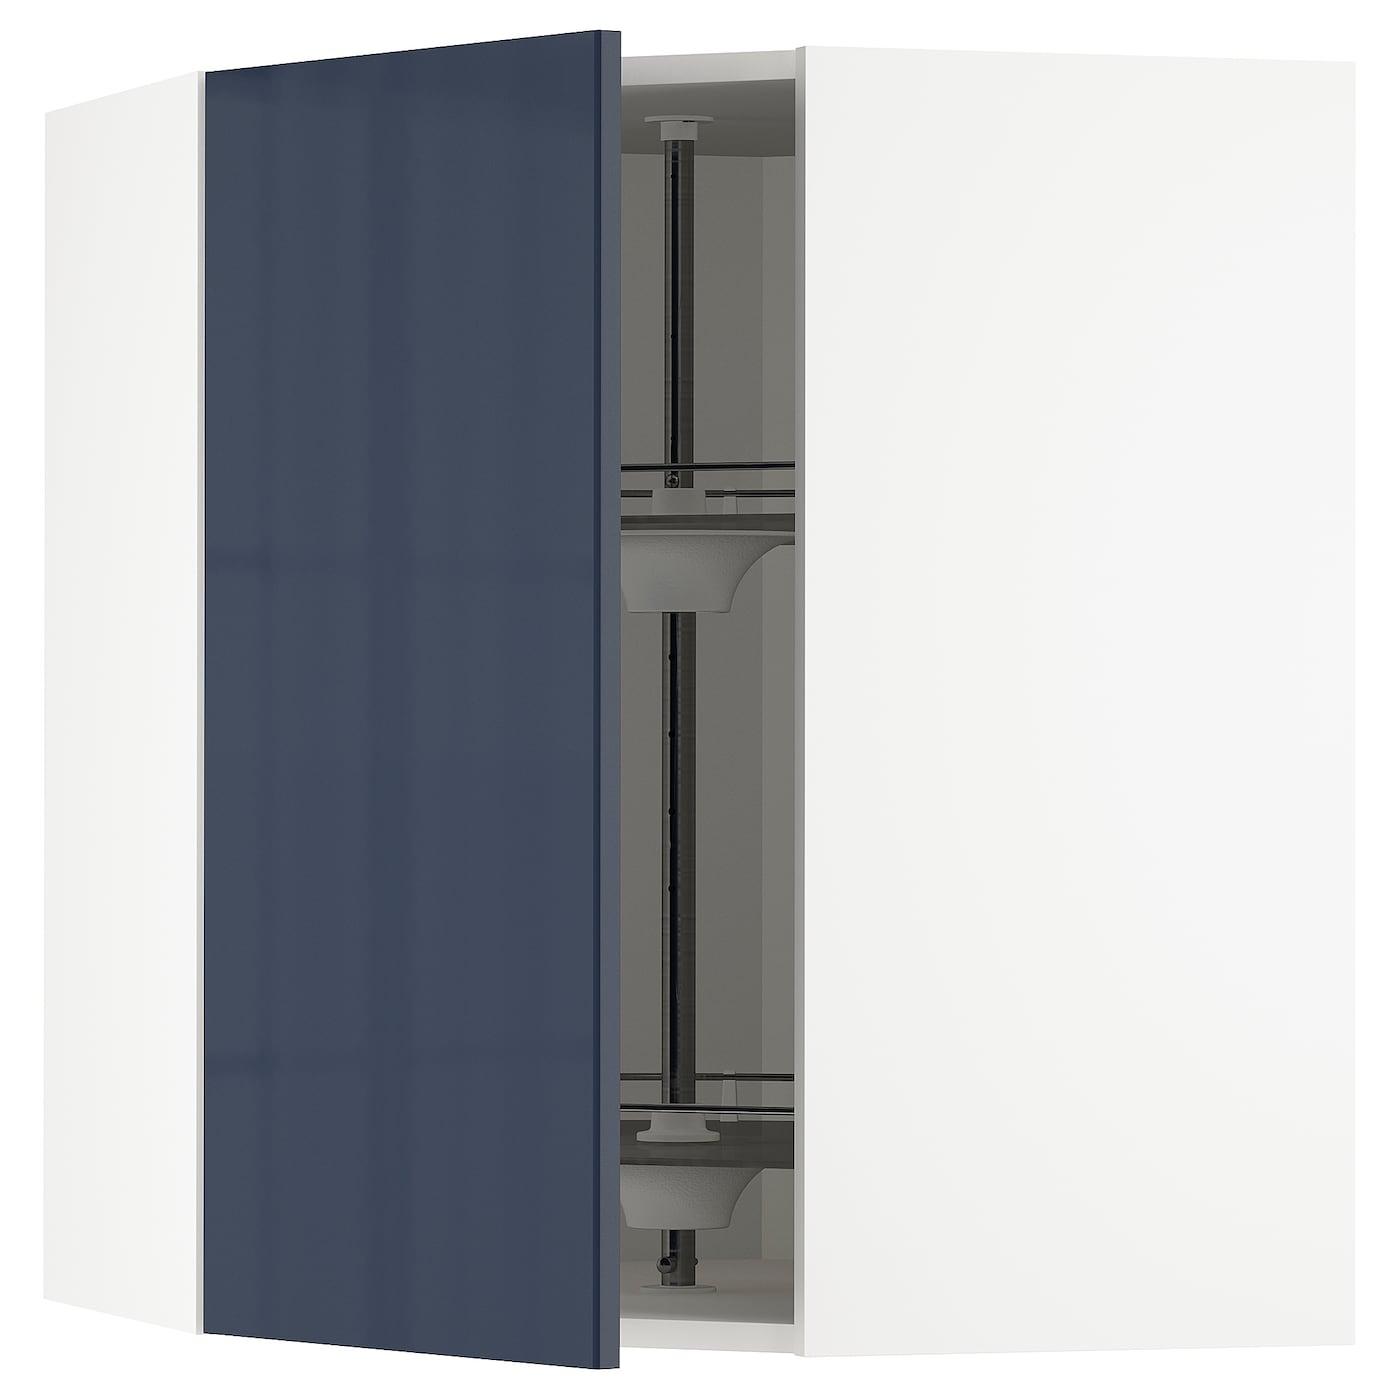 Pensile Angolare Cucina Ikea metod corner wall cabinet with carousel - white, järsta black-blue 68x37x80  cm